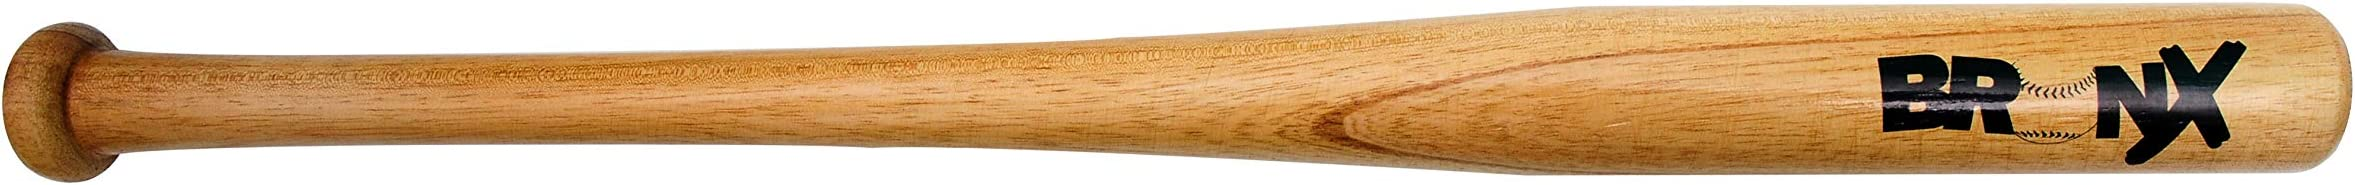 Bronx 30 Pulgadas Bate de b/éisbol Natural Juvenil